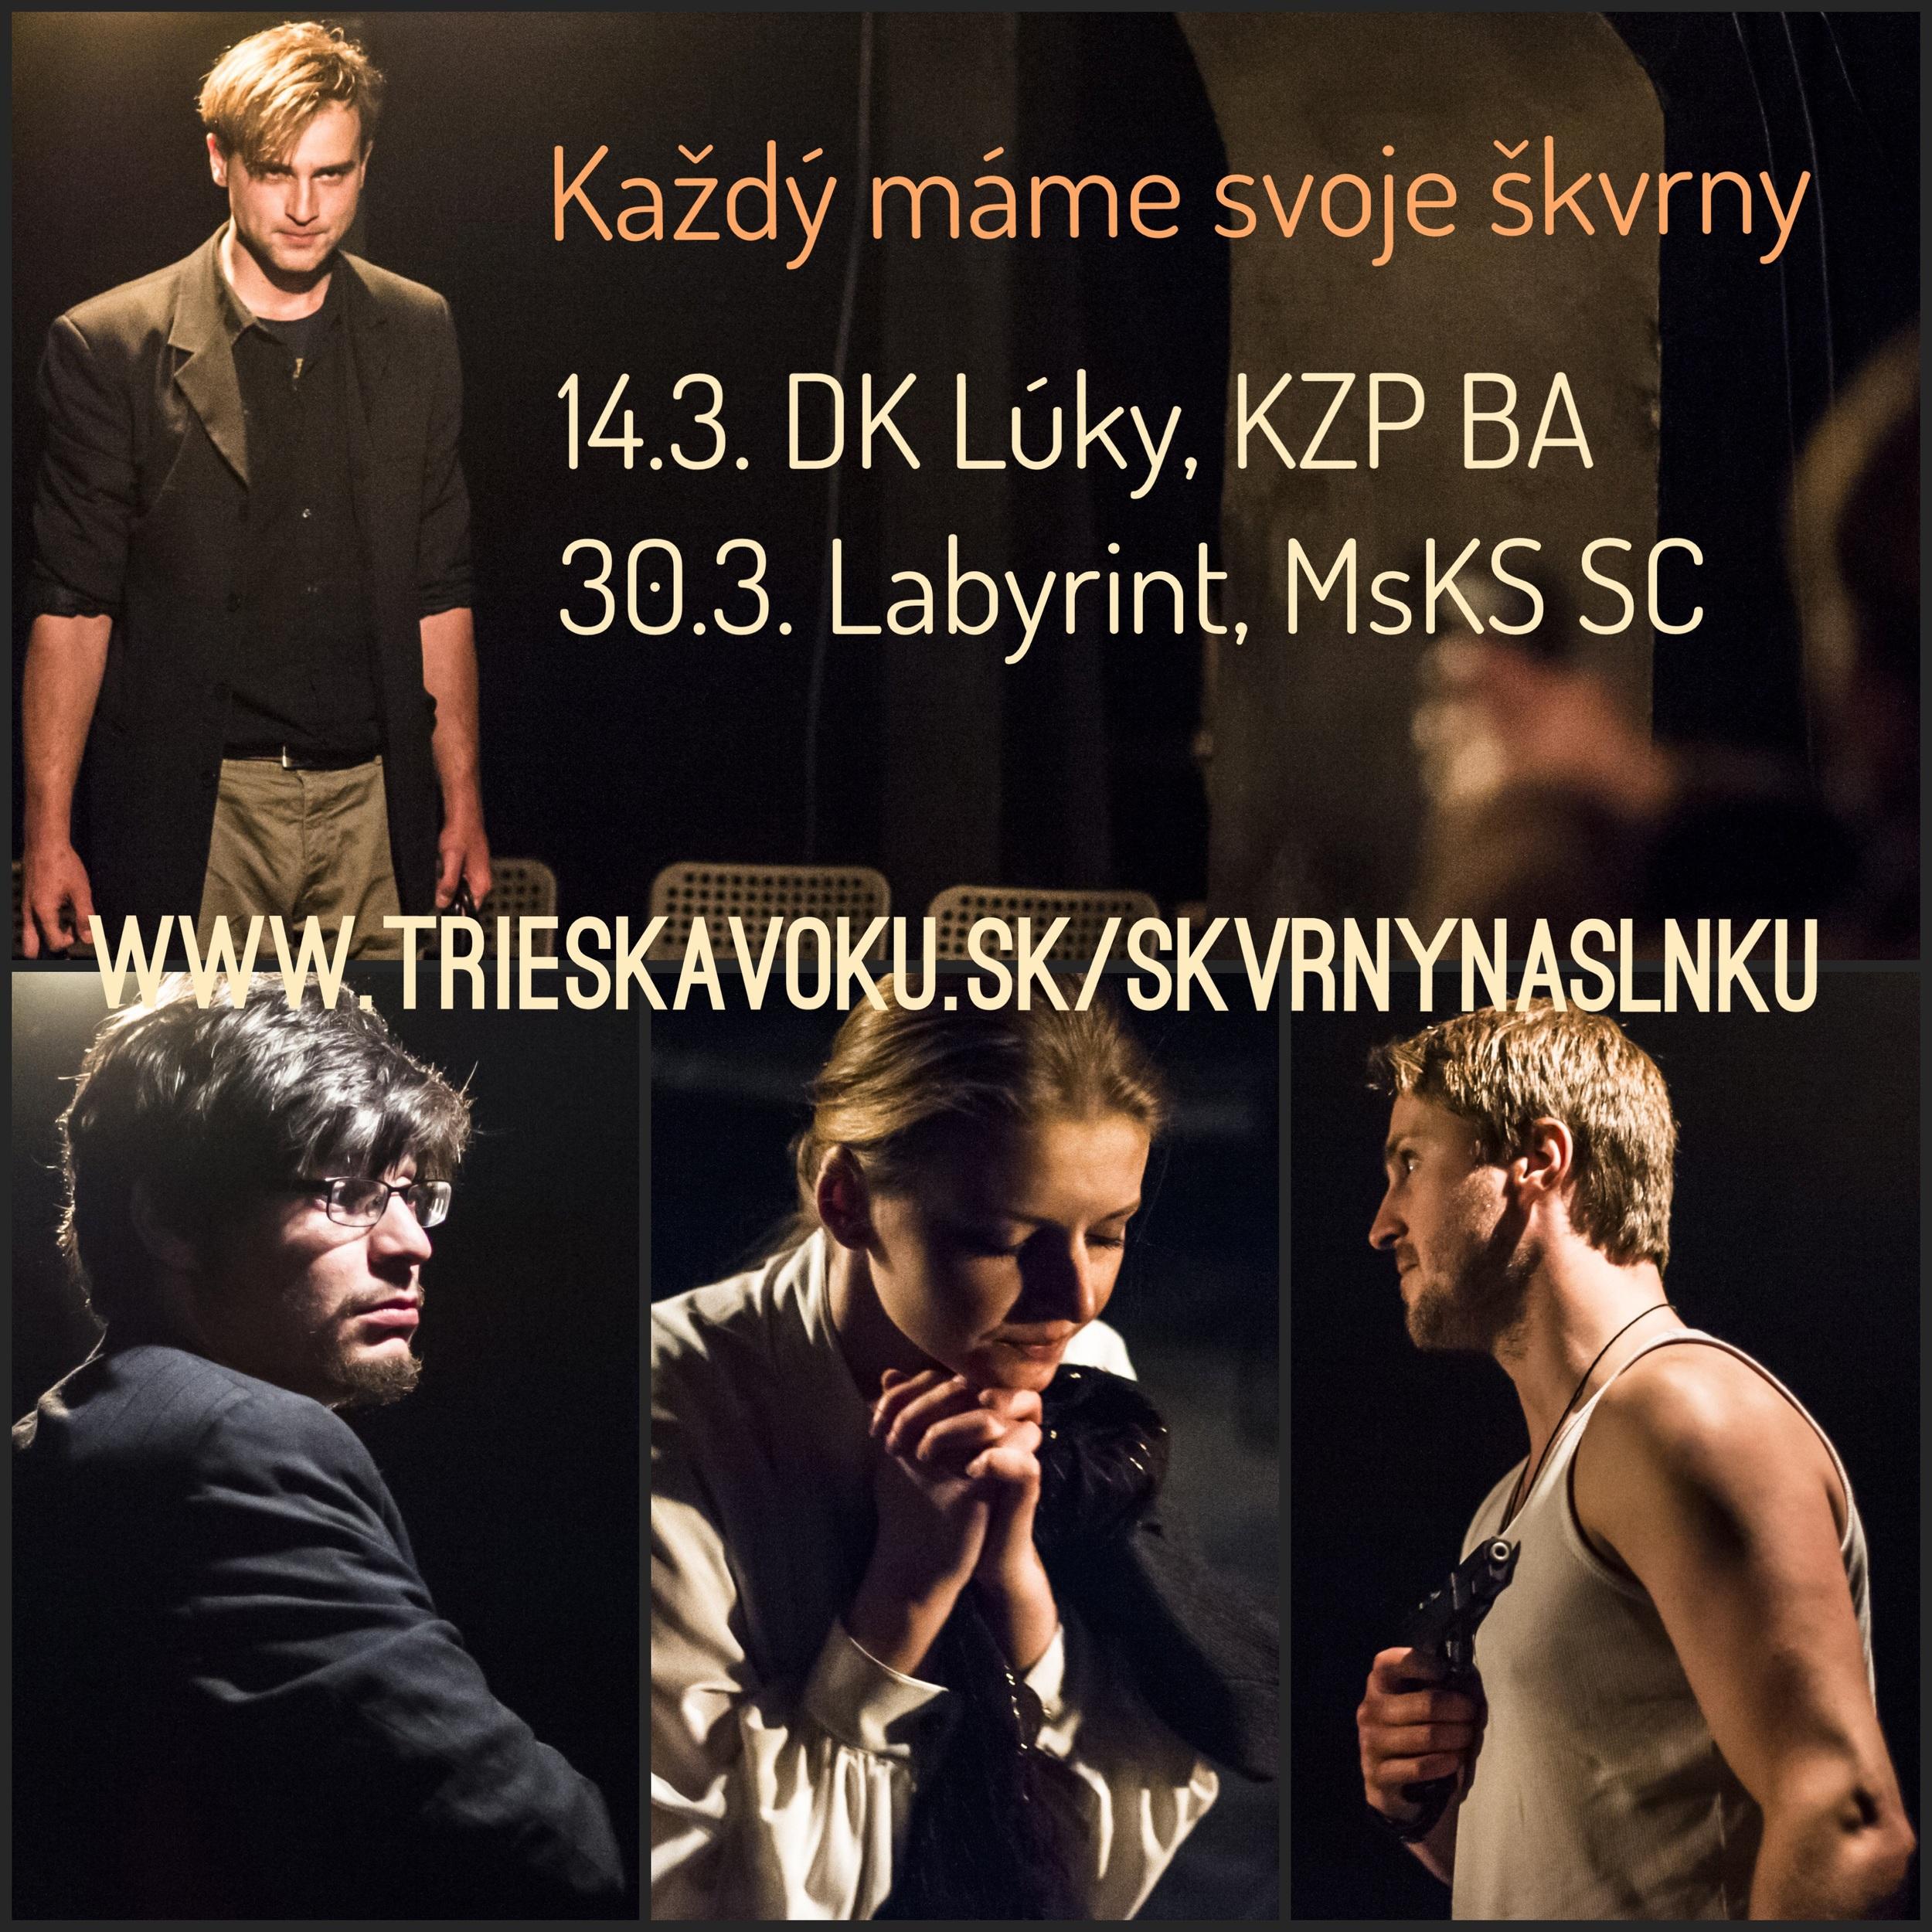 http://www.kzp.sk/ine/podujatie/leopoldlaholaskvrnynaslnku